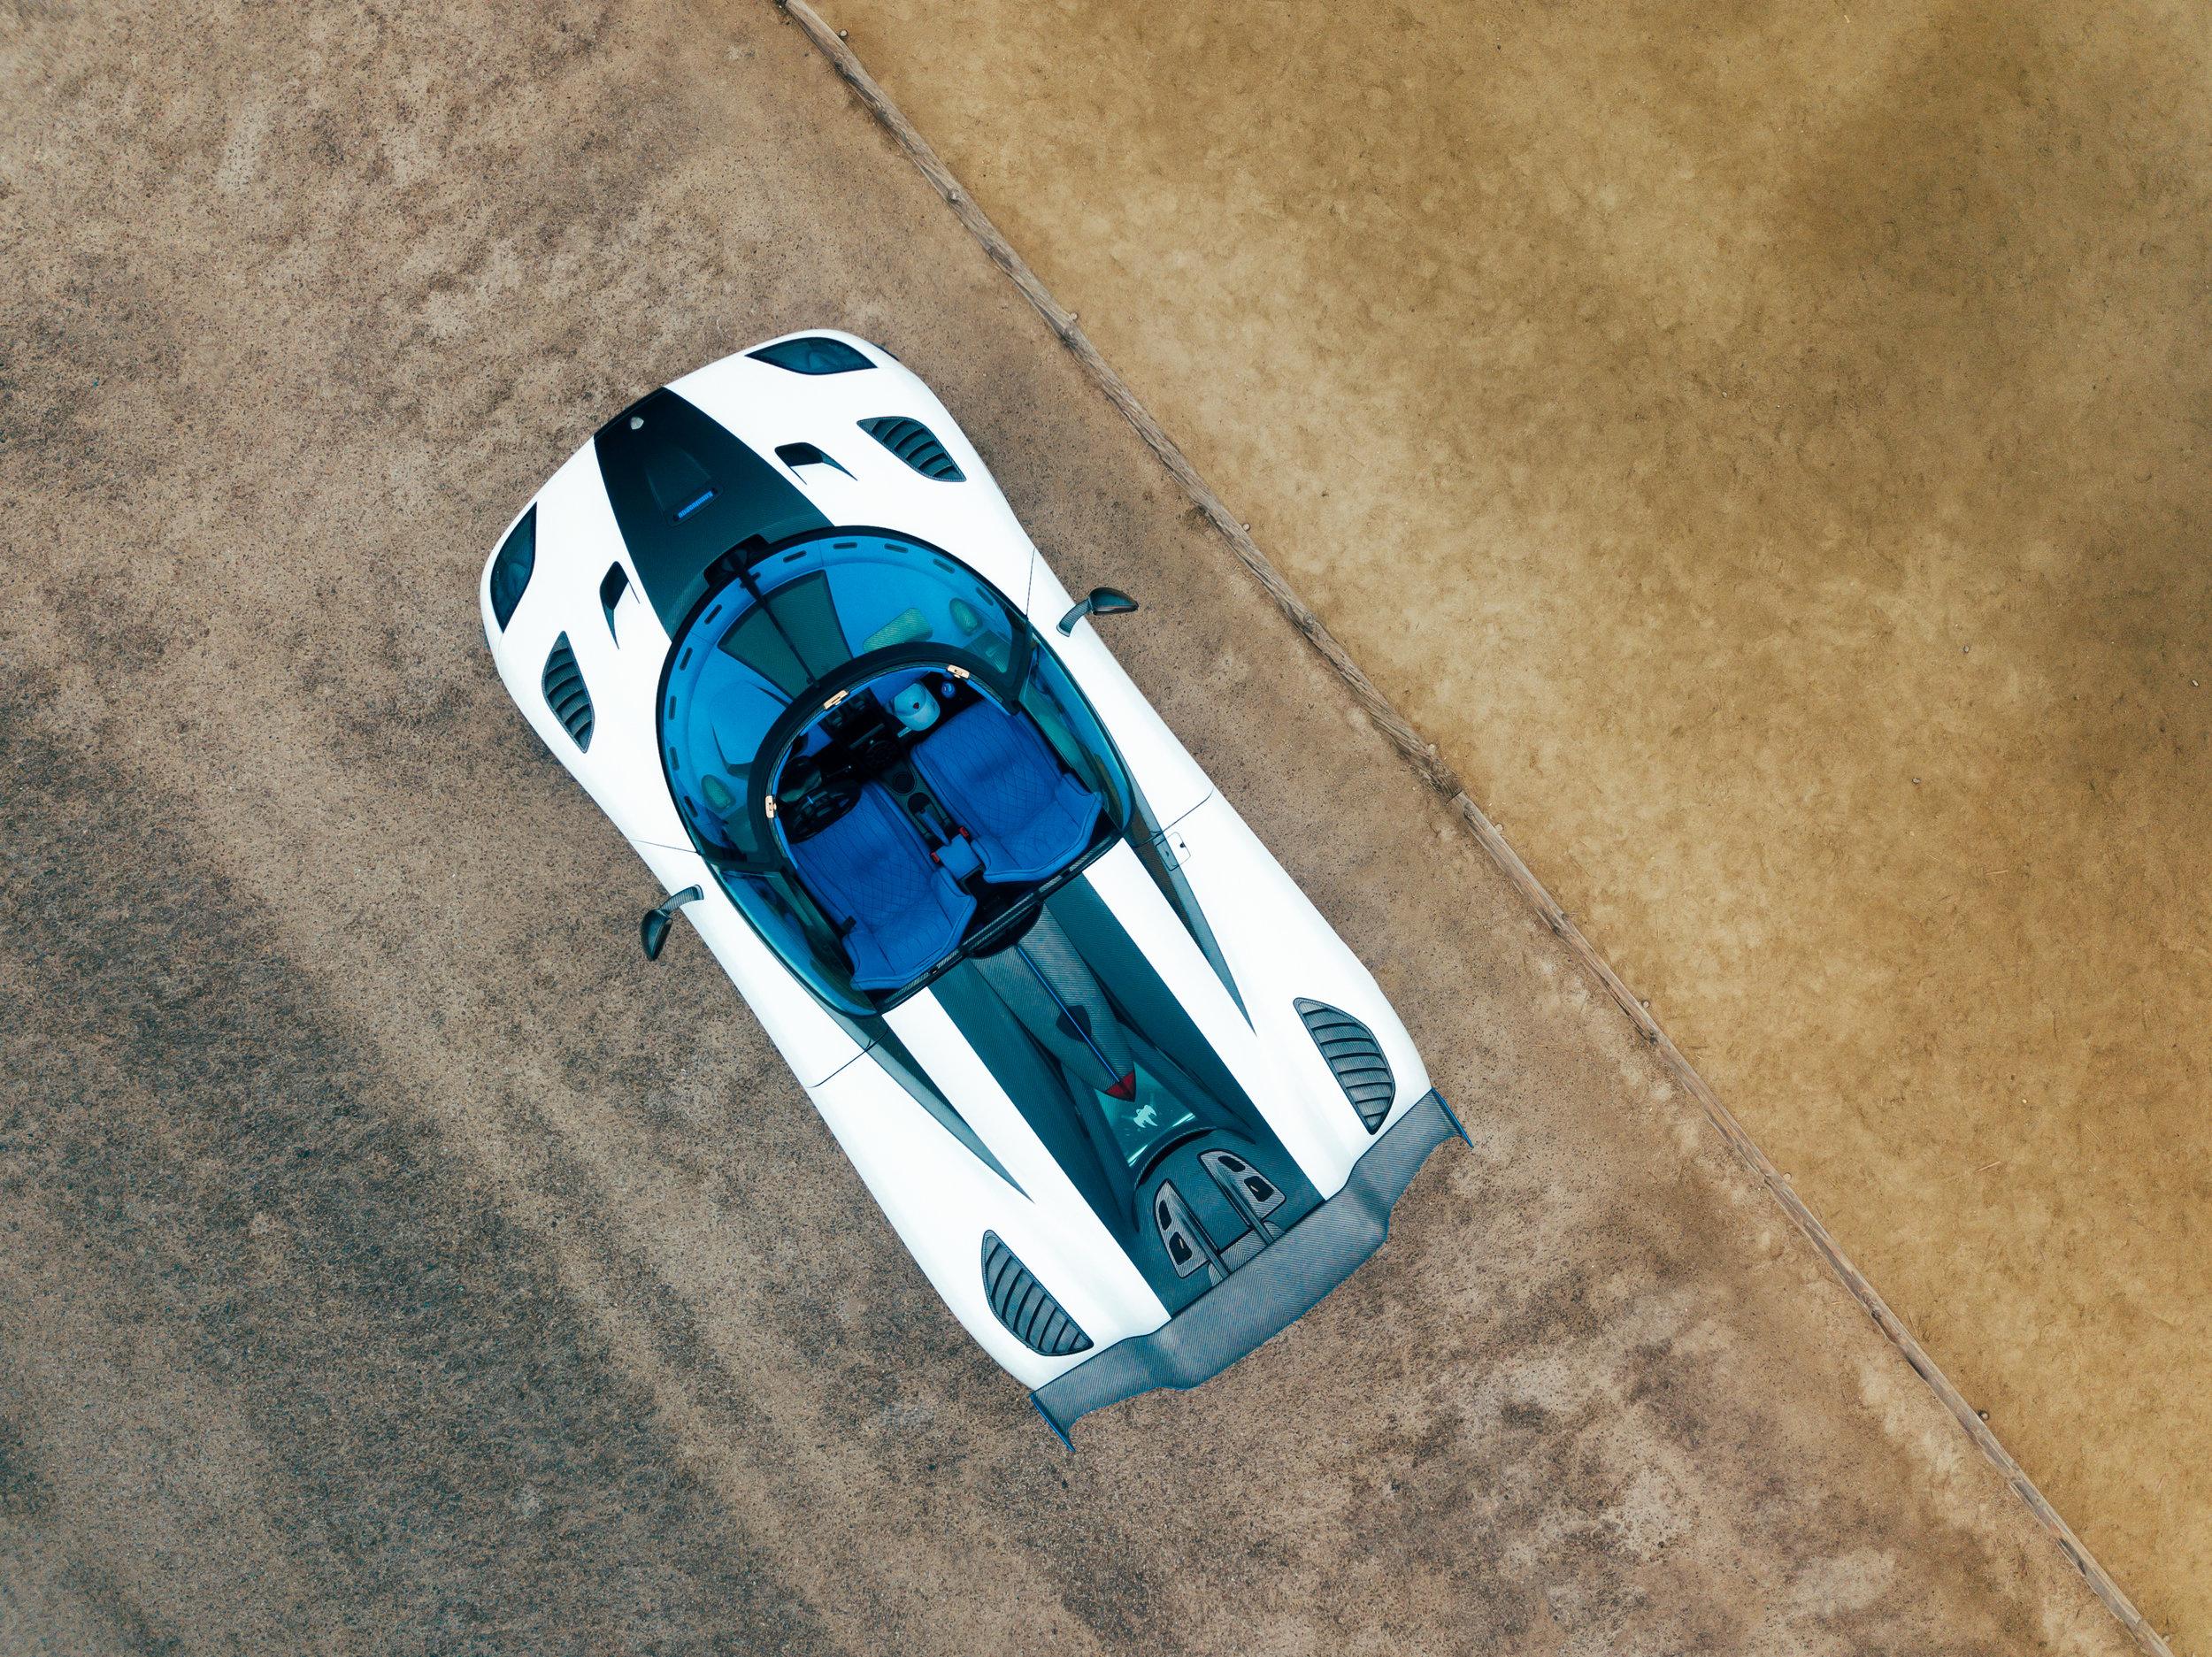 Stay_Driven_Monterey_Car_Week_Whitesse_Koenigsegg-2.jpg